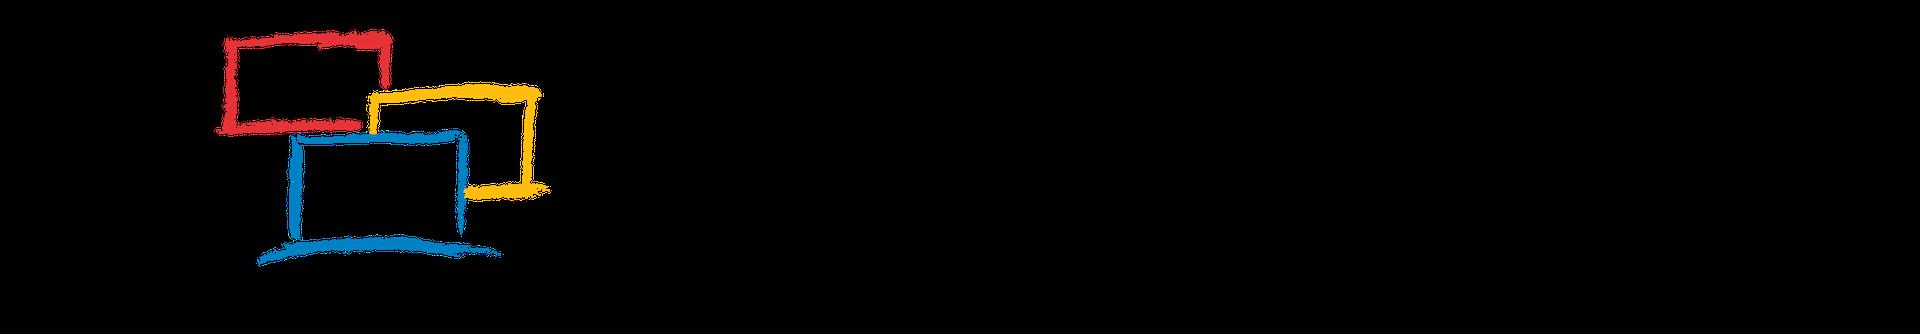 Syndicat des employé(e)s de TVA – SCFP 687